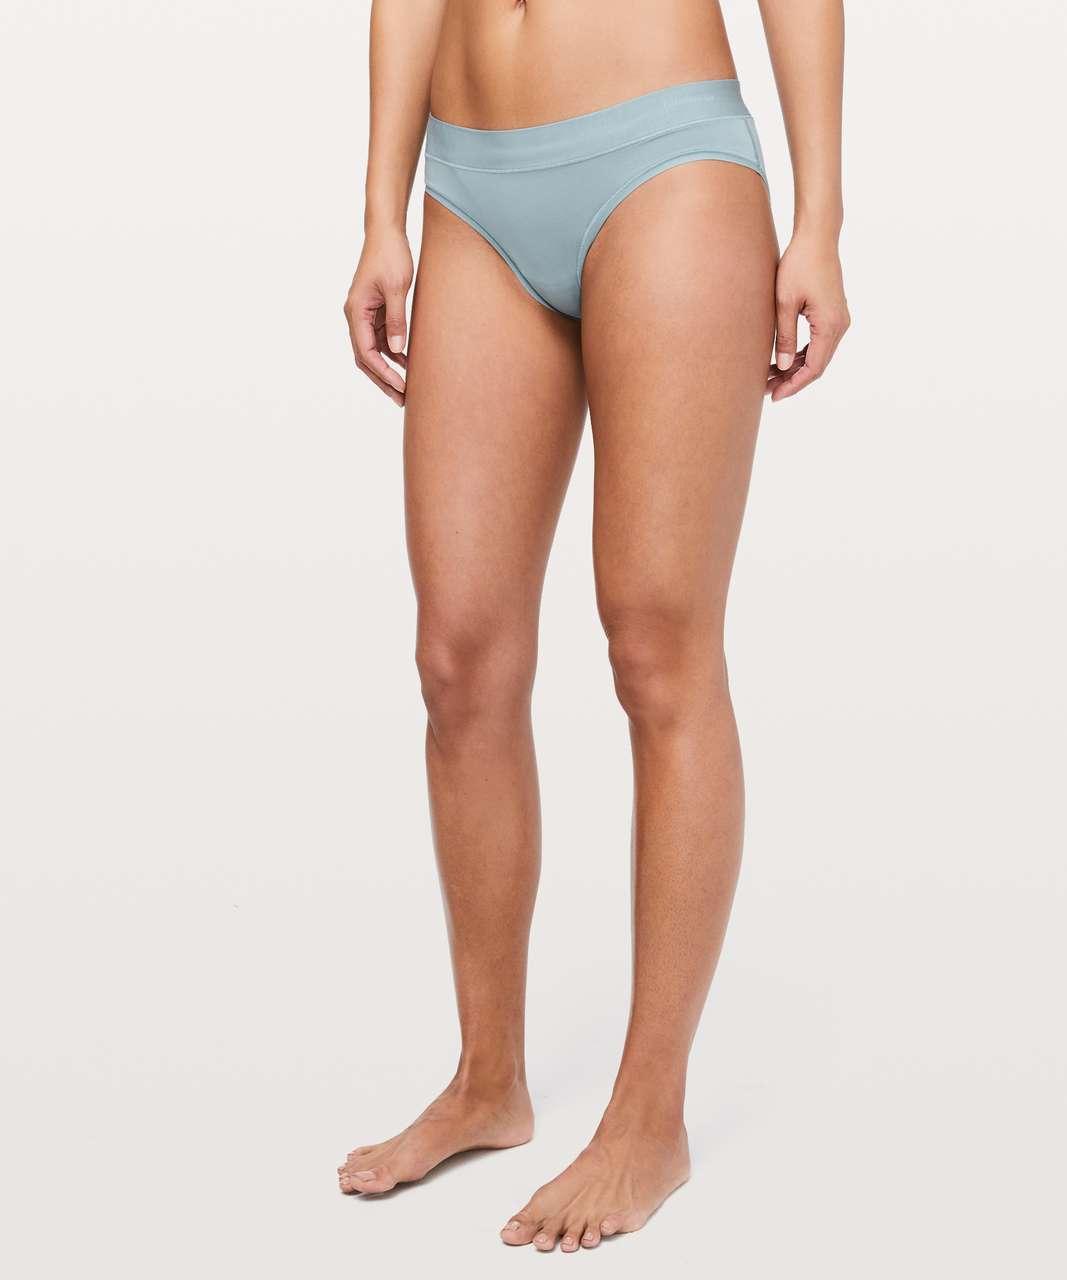 Lululemon Mula Bandhawear Bikini *3 Pack - Pink Glow / Washed Marble Alpine White Silverscreen / Blue Cast